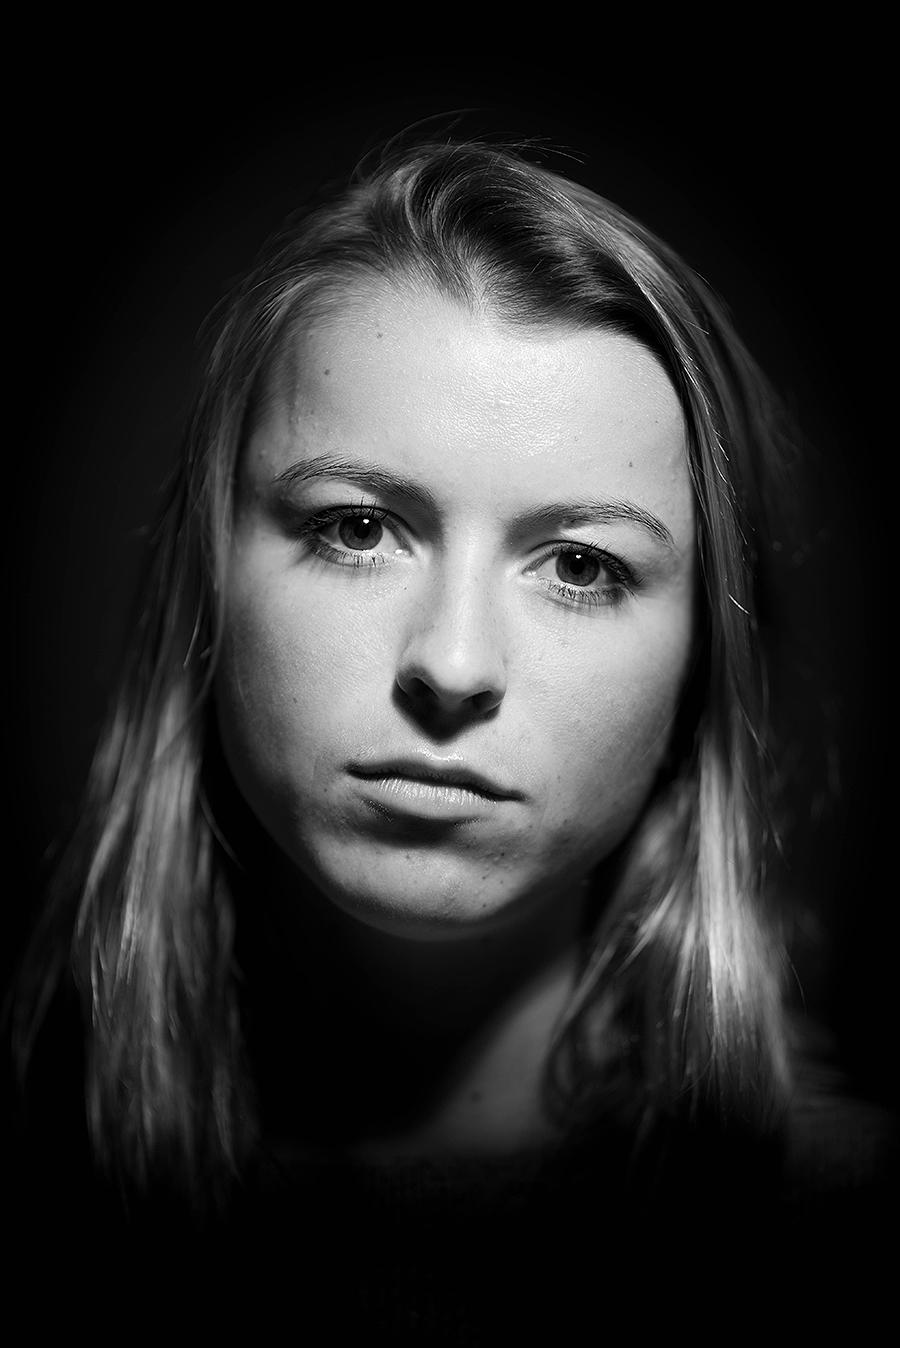 Megan_A1_Sadness_photography_model_photo_emotion_portrait_headshot_kaleb_germinaro.jpg